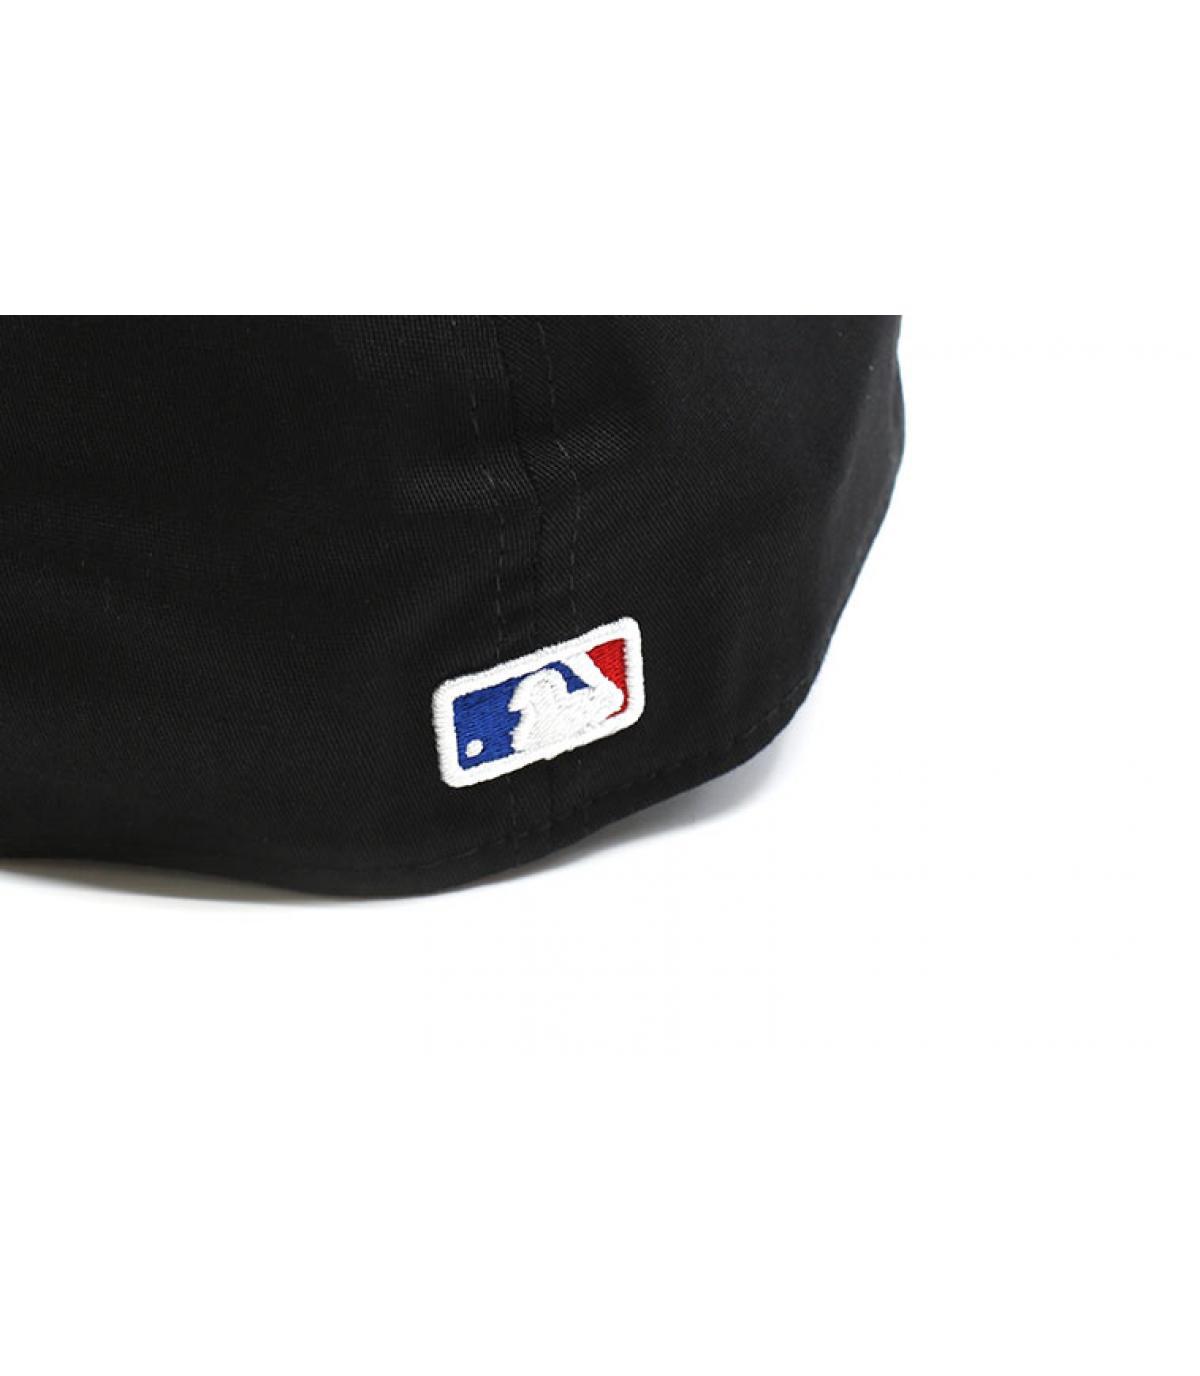 Dettagli League Ess NY 39Thirty black olive - image 5